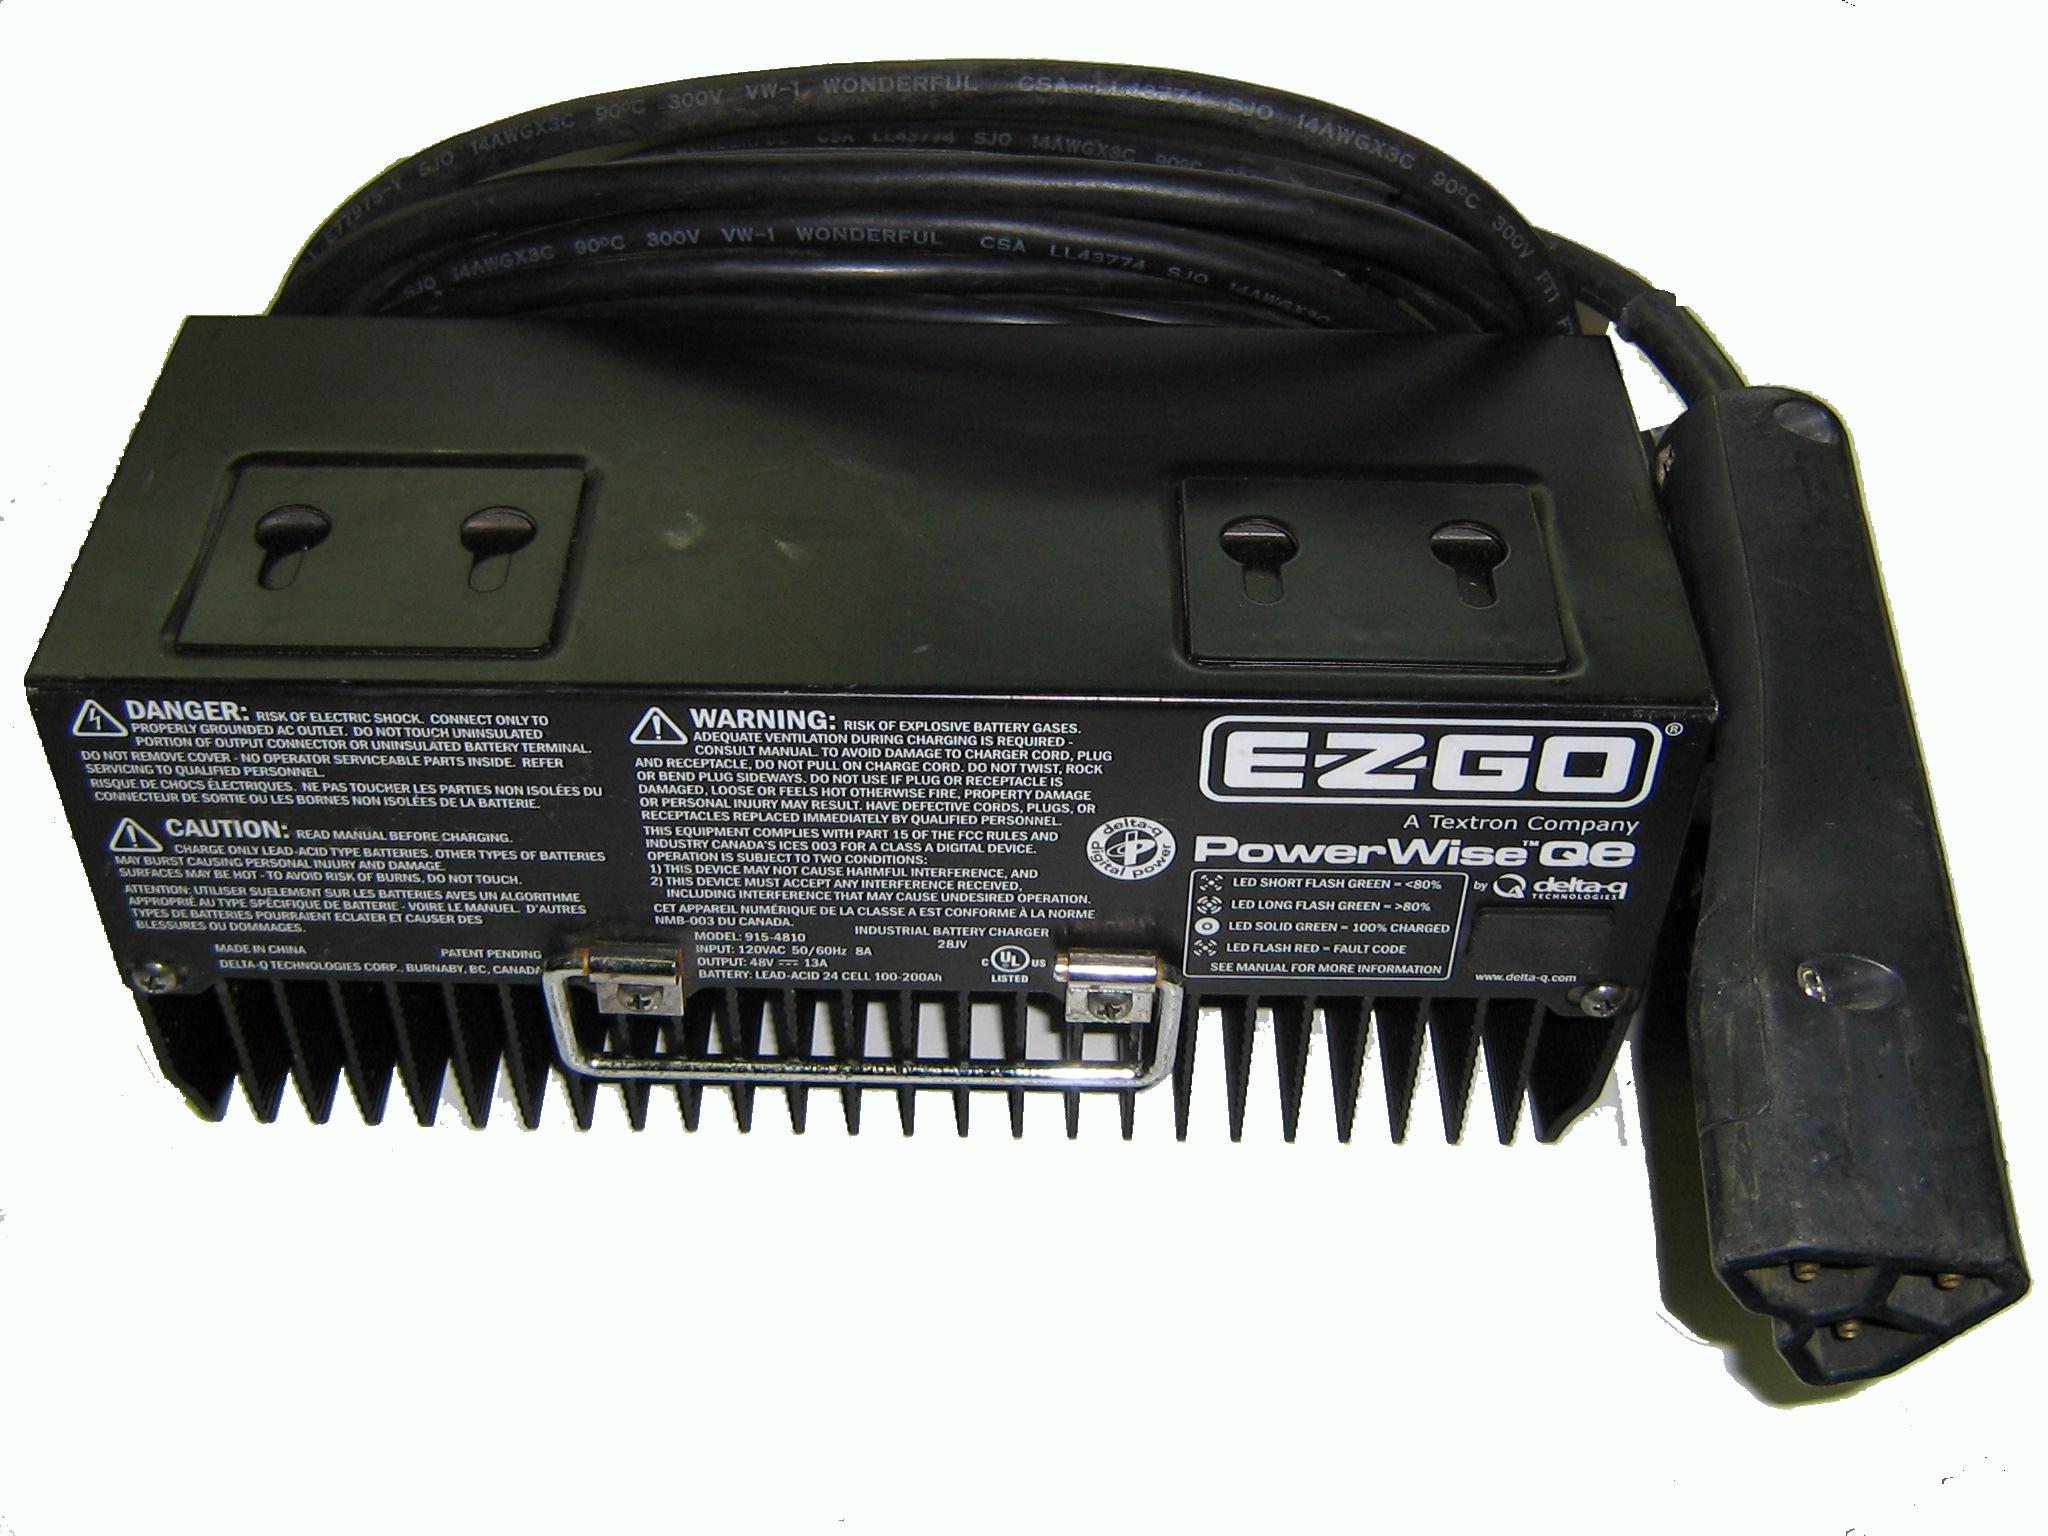 915 3610 Ezgo Wire Diagram